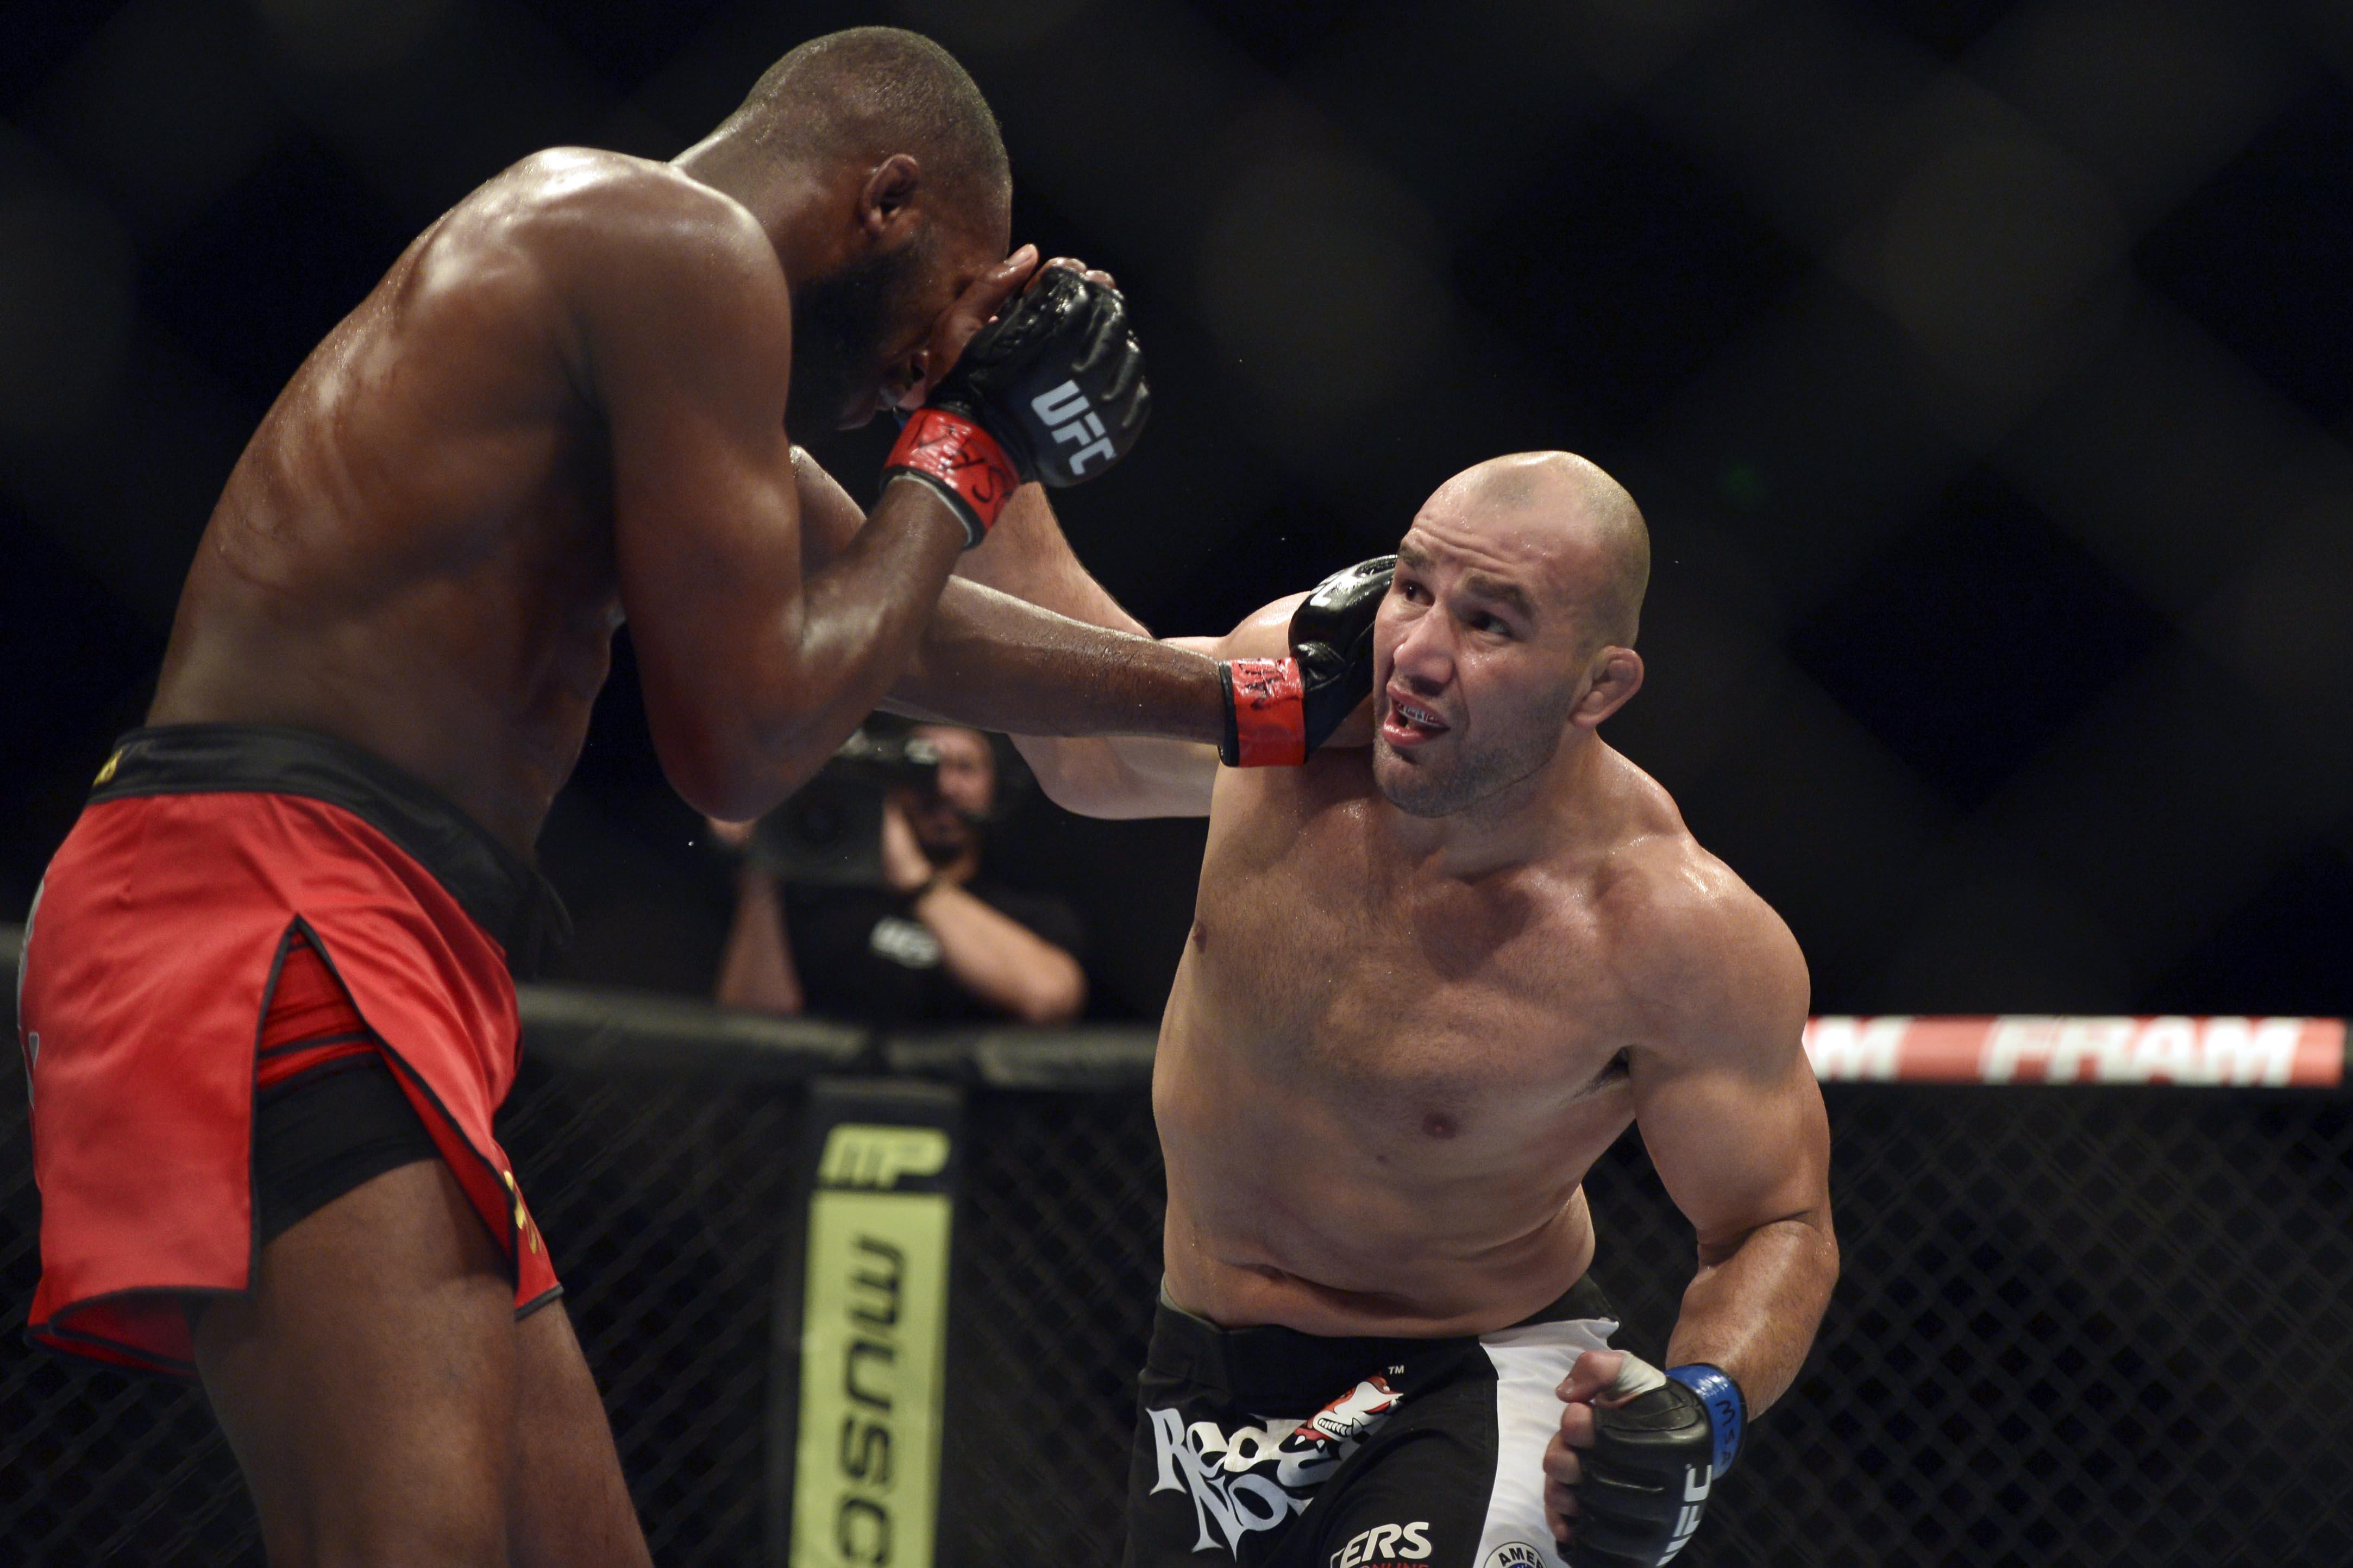 Clay says that Glover Teixeira [R] has nasty KO power.